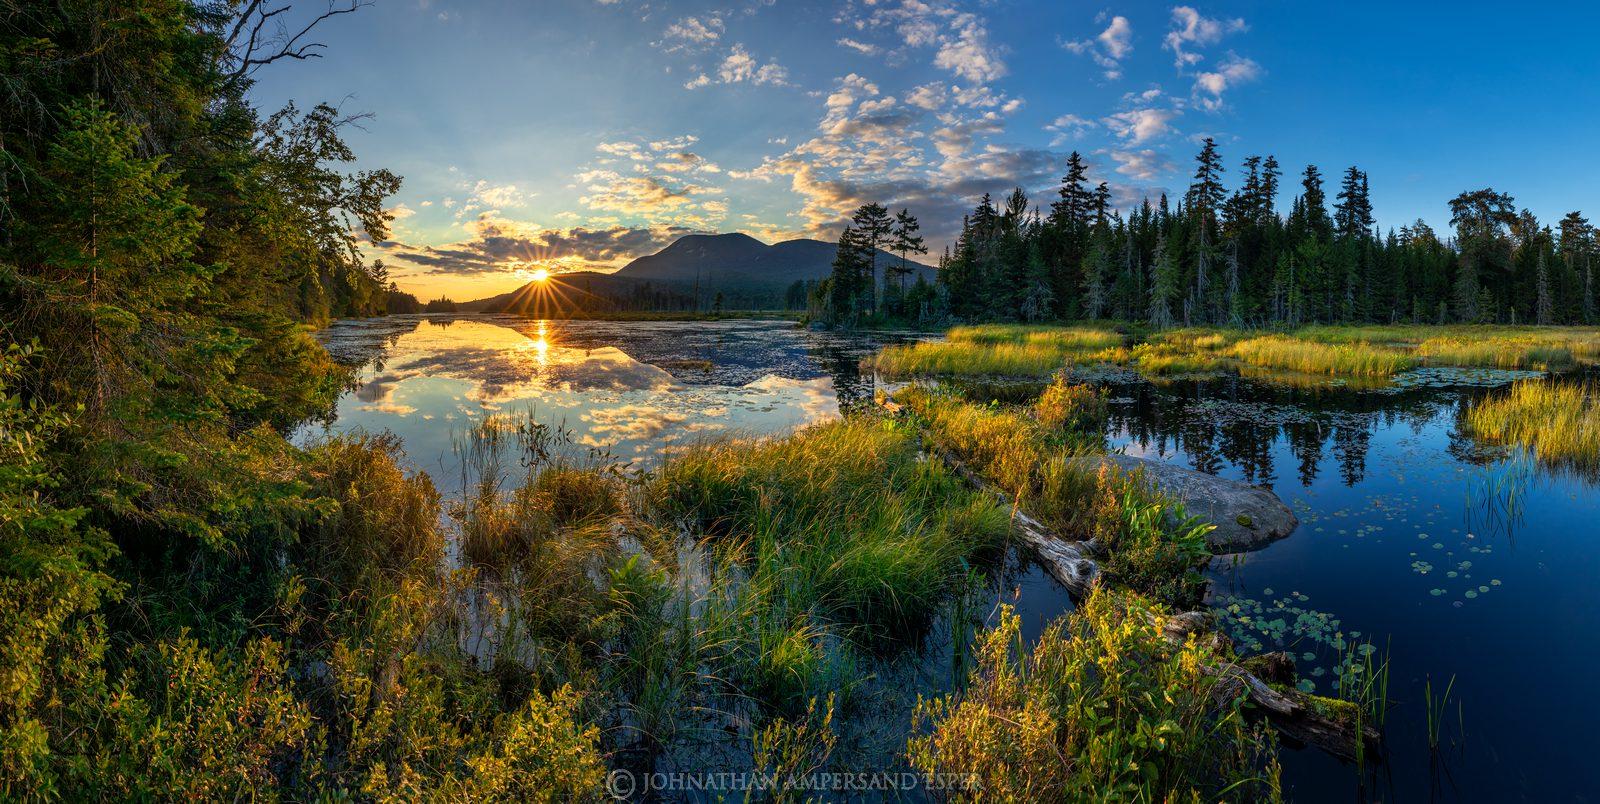 ONeil Flow,O'Neil Flow,Blue Mountain,Blue Mt,wetland,summer,2017,Adirondack photography,Adirondacks,photography,landscape,sunset...